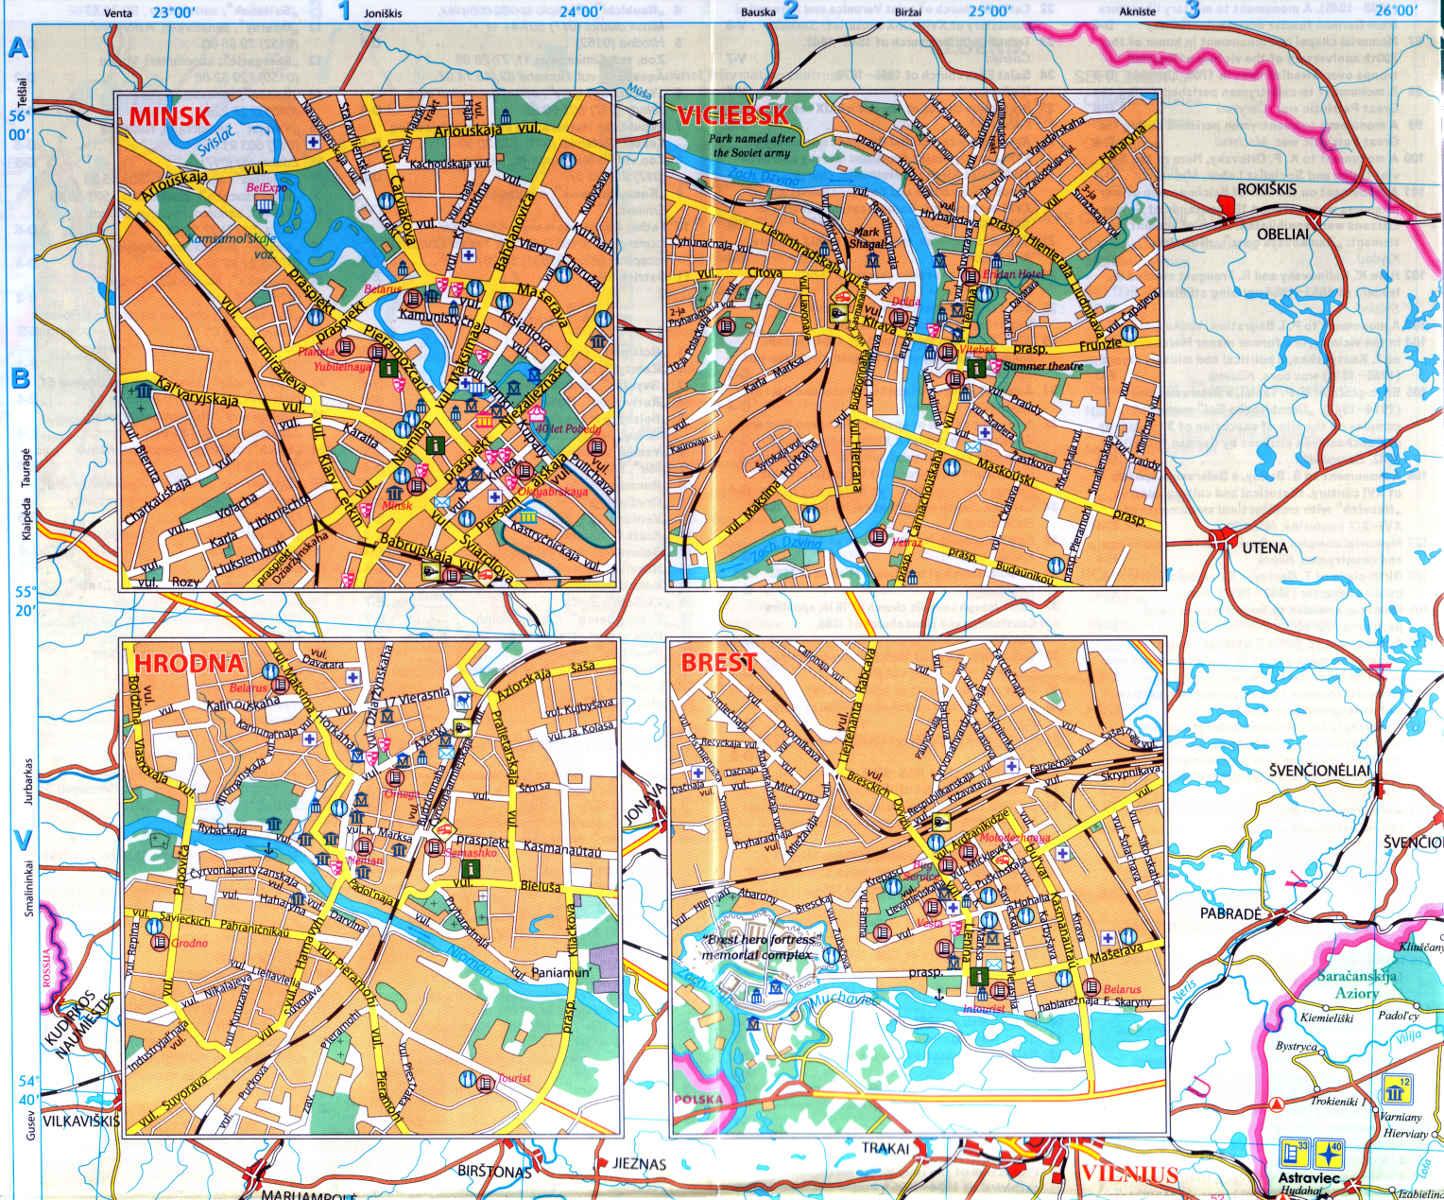 Belarus on map MINSK VITEBSK GRODNO BREST Belarus Tourist Map